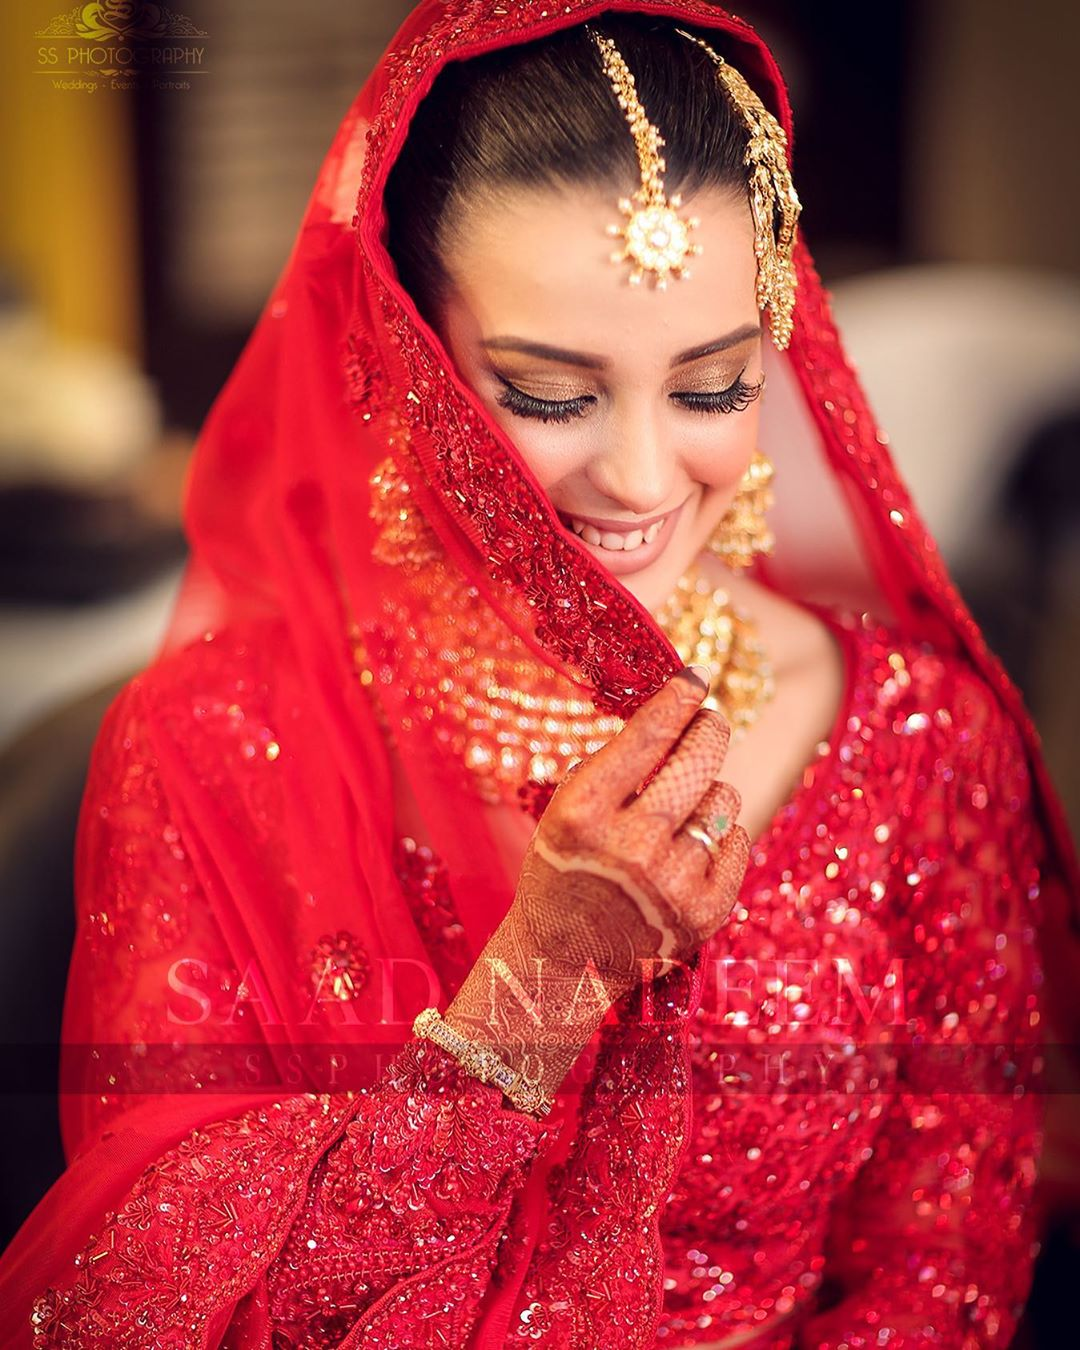 Iqra Aziz and Yasir Hussain Wedding Pictures (12)